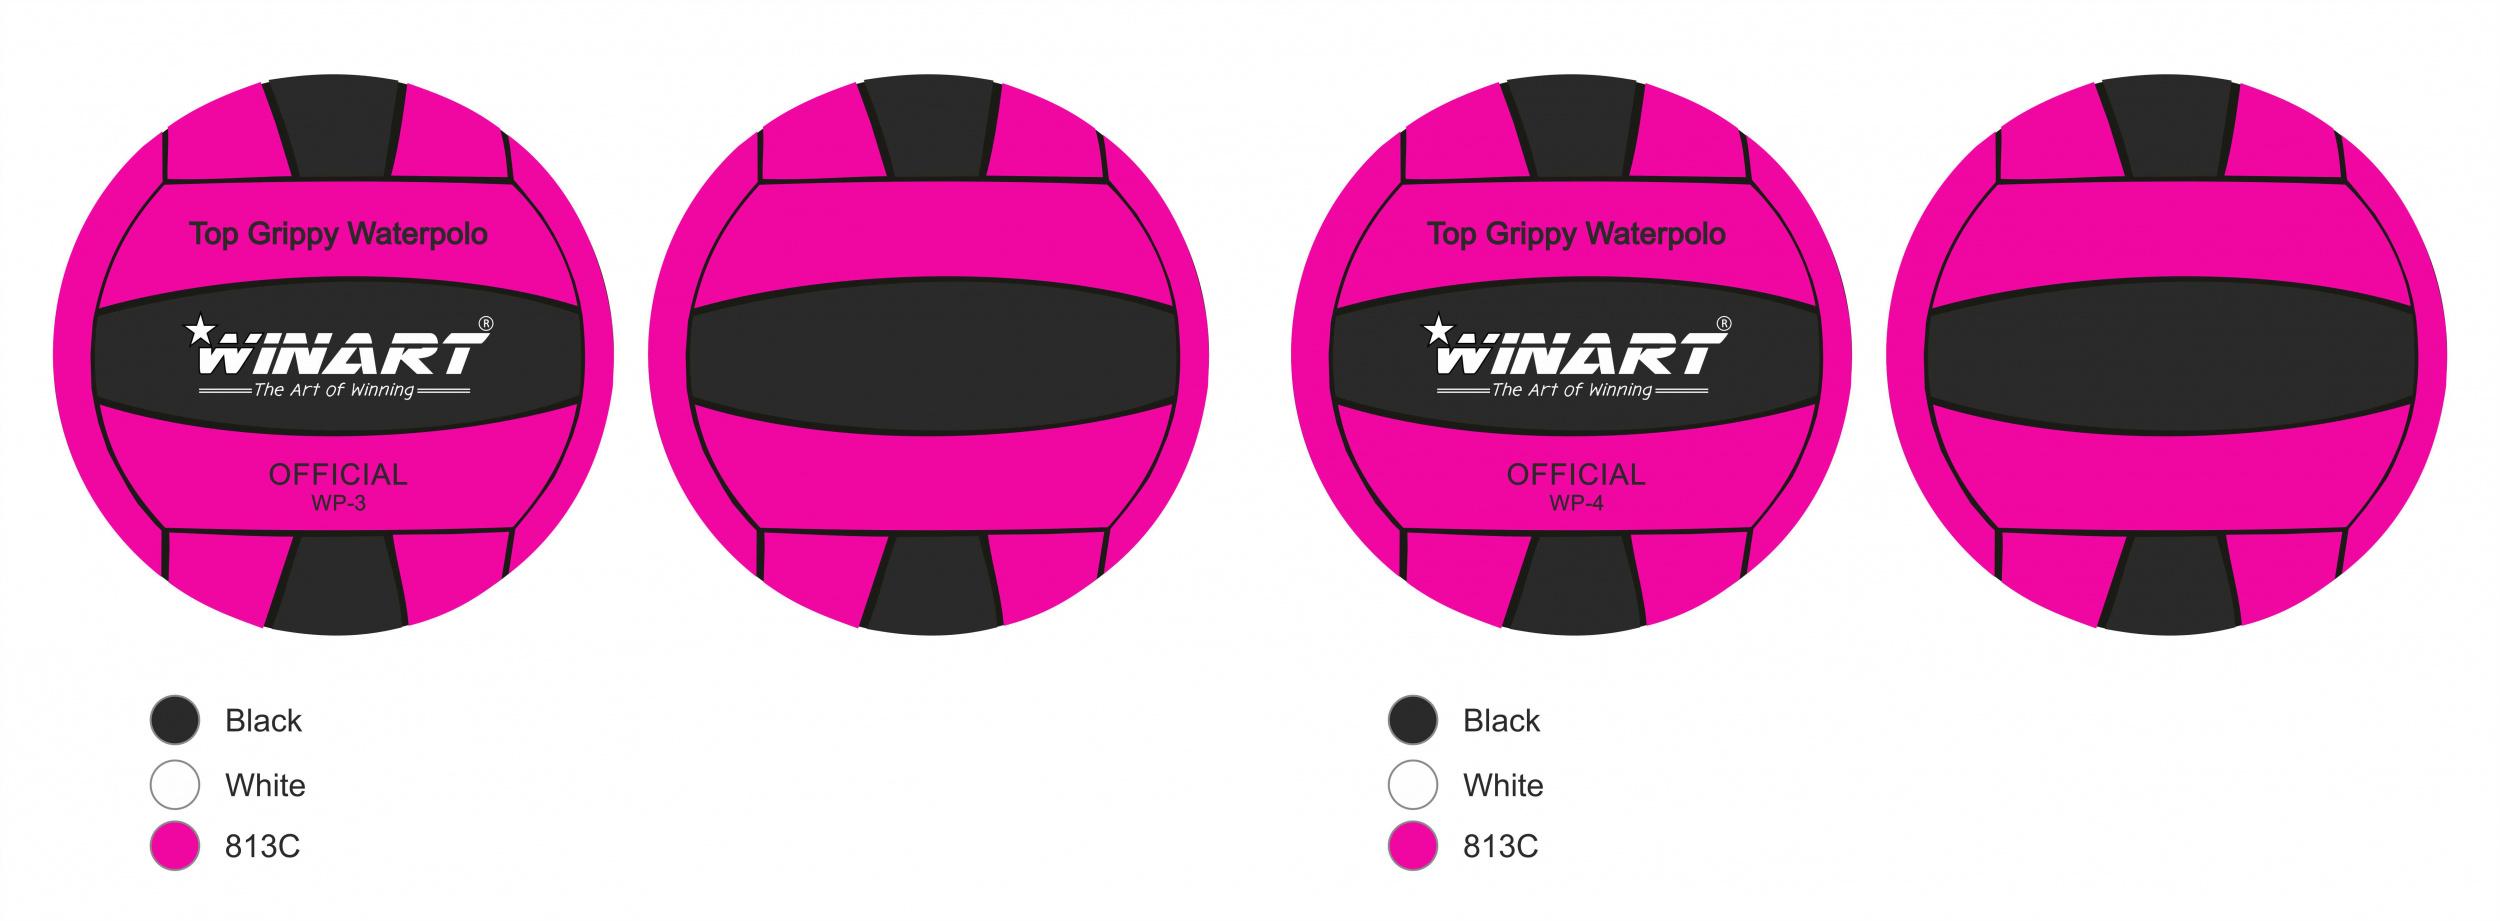 Winart Waterpolobal roze/zwart mt. 3